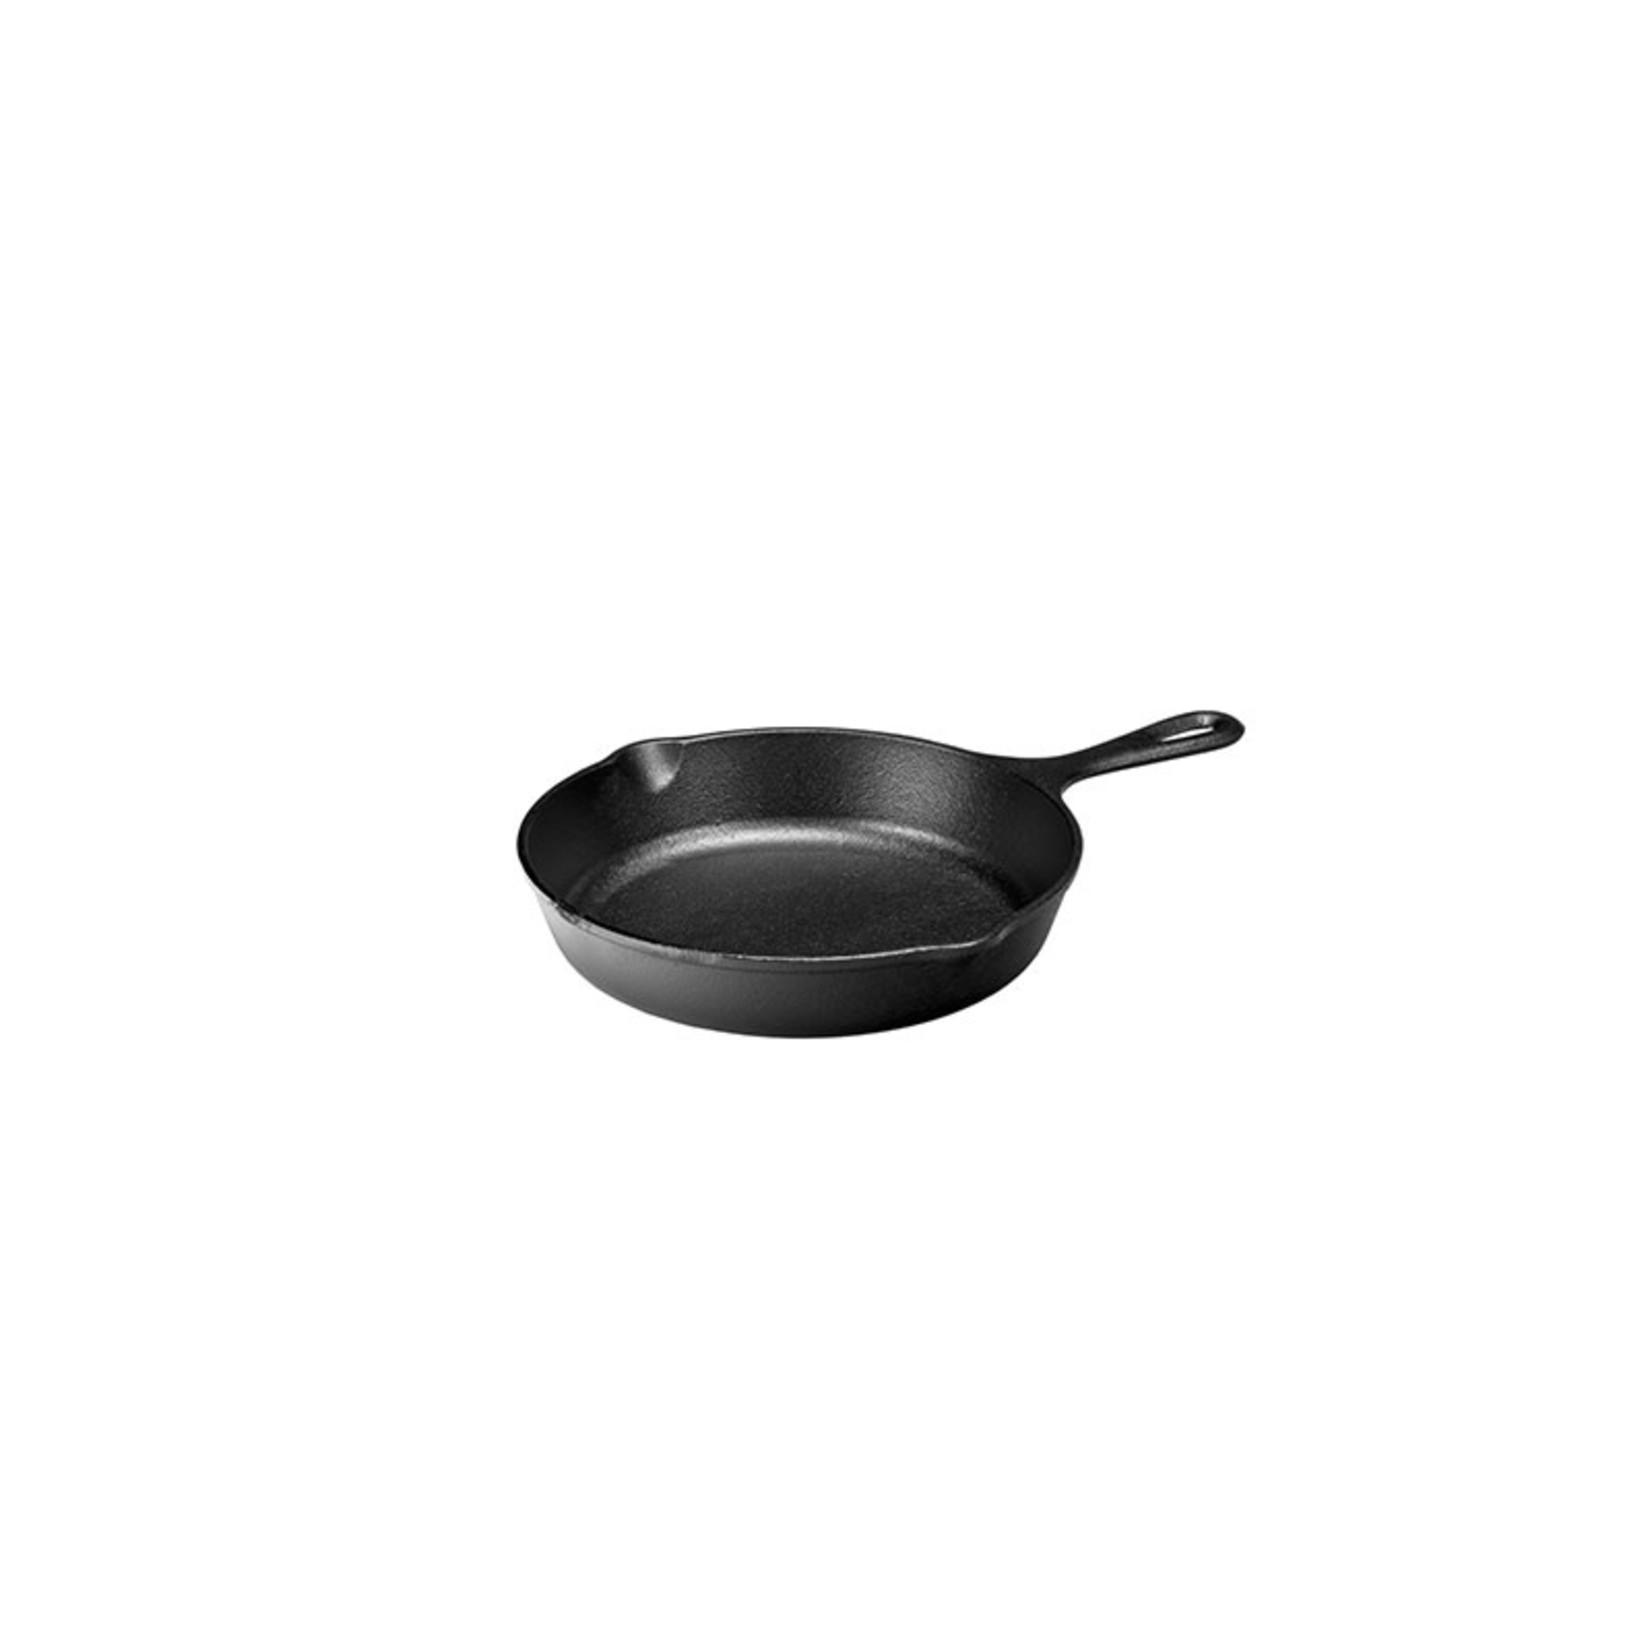 "Lodge Lodge Cookware Skillet Pan 9"""